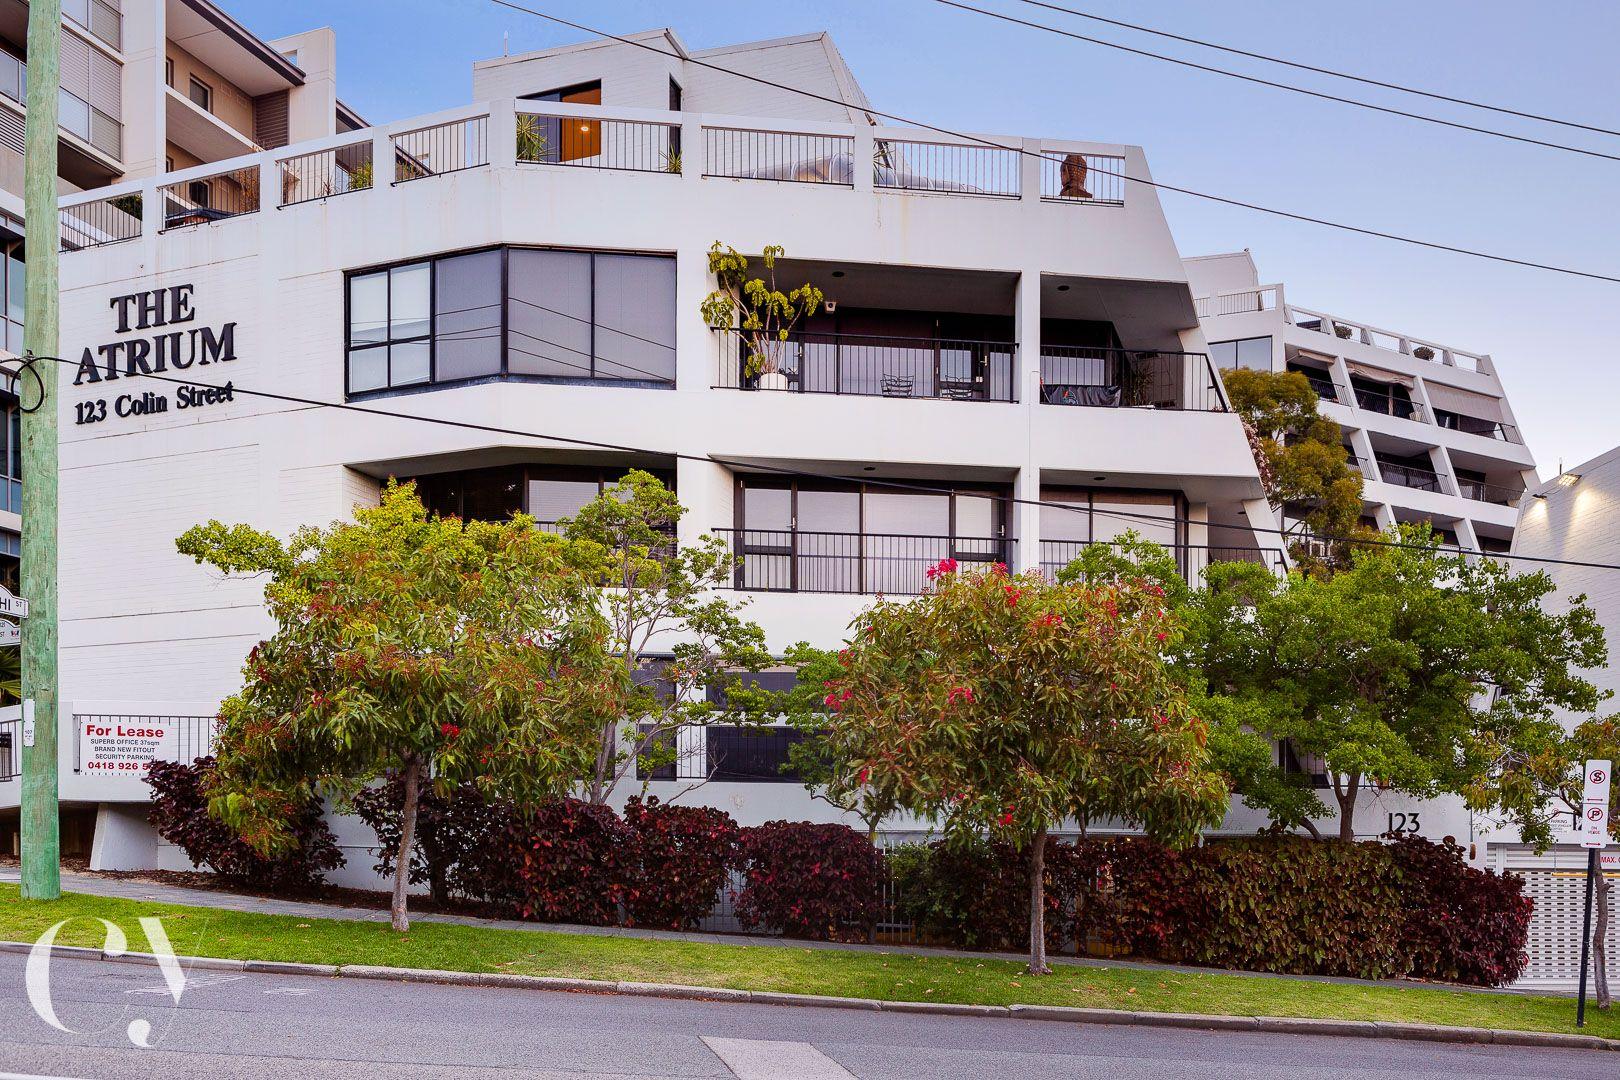 28/123 Colin Street, West Perth WA 6005, Image 1